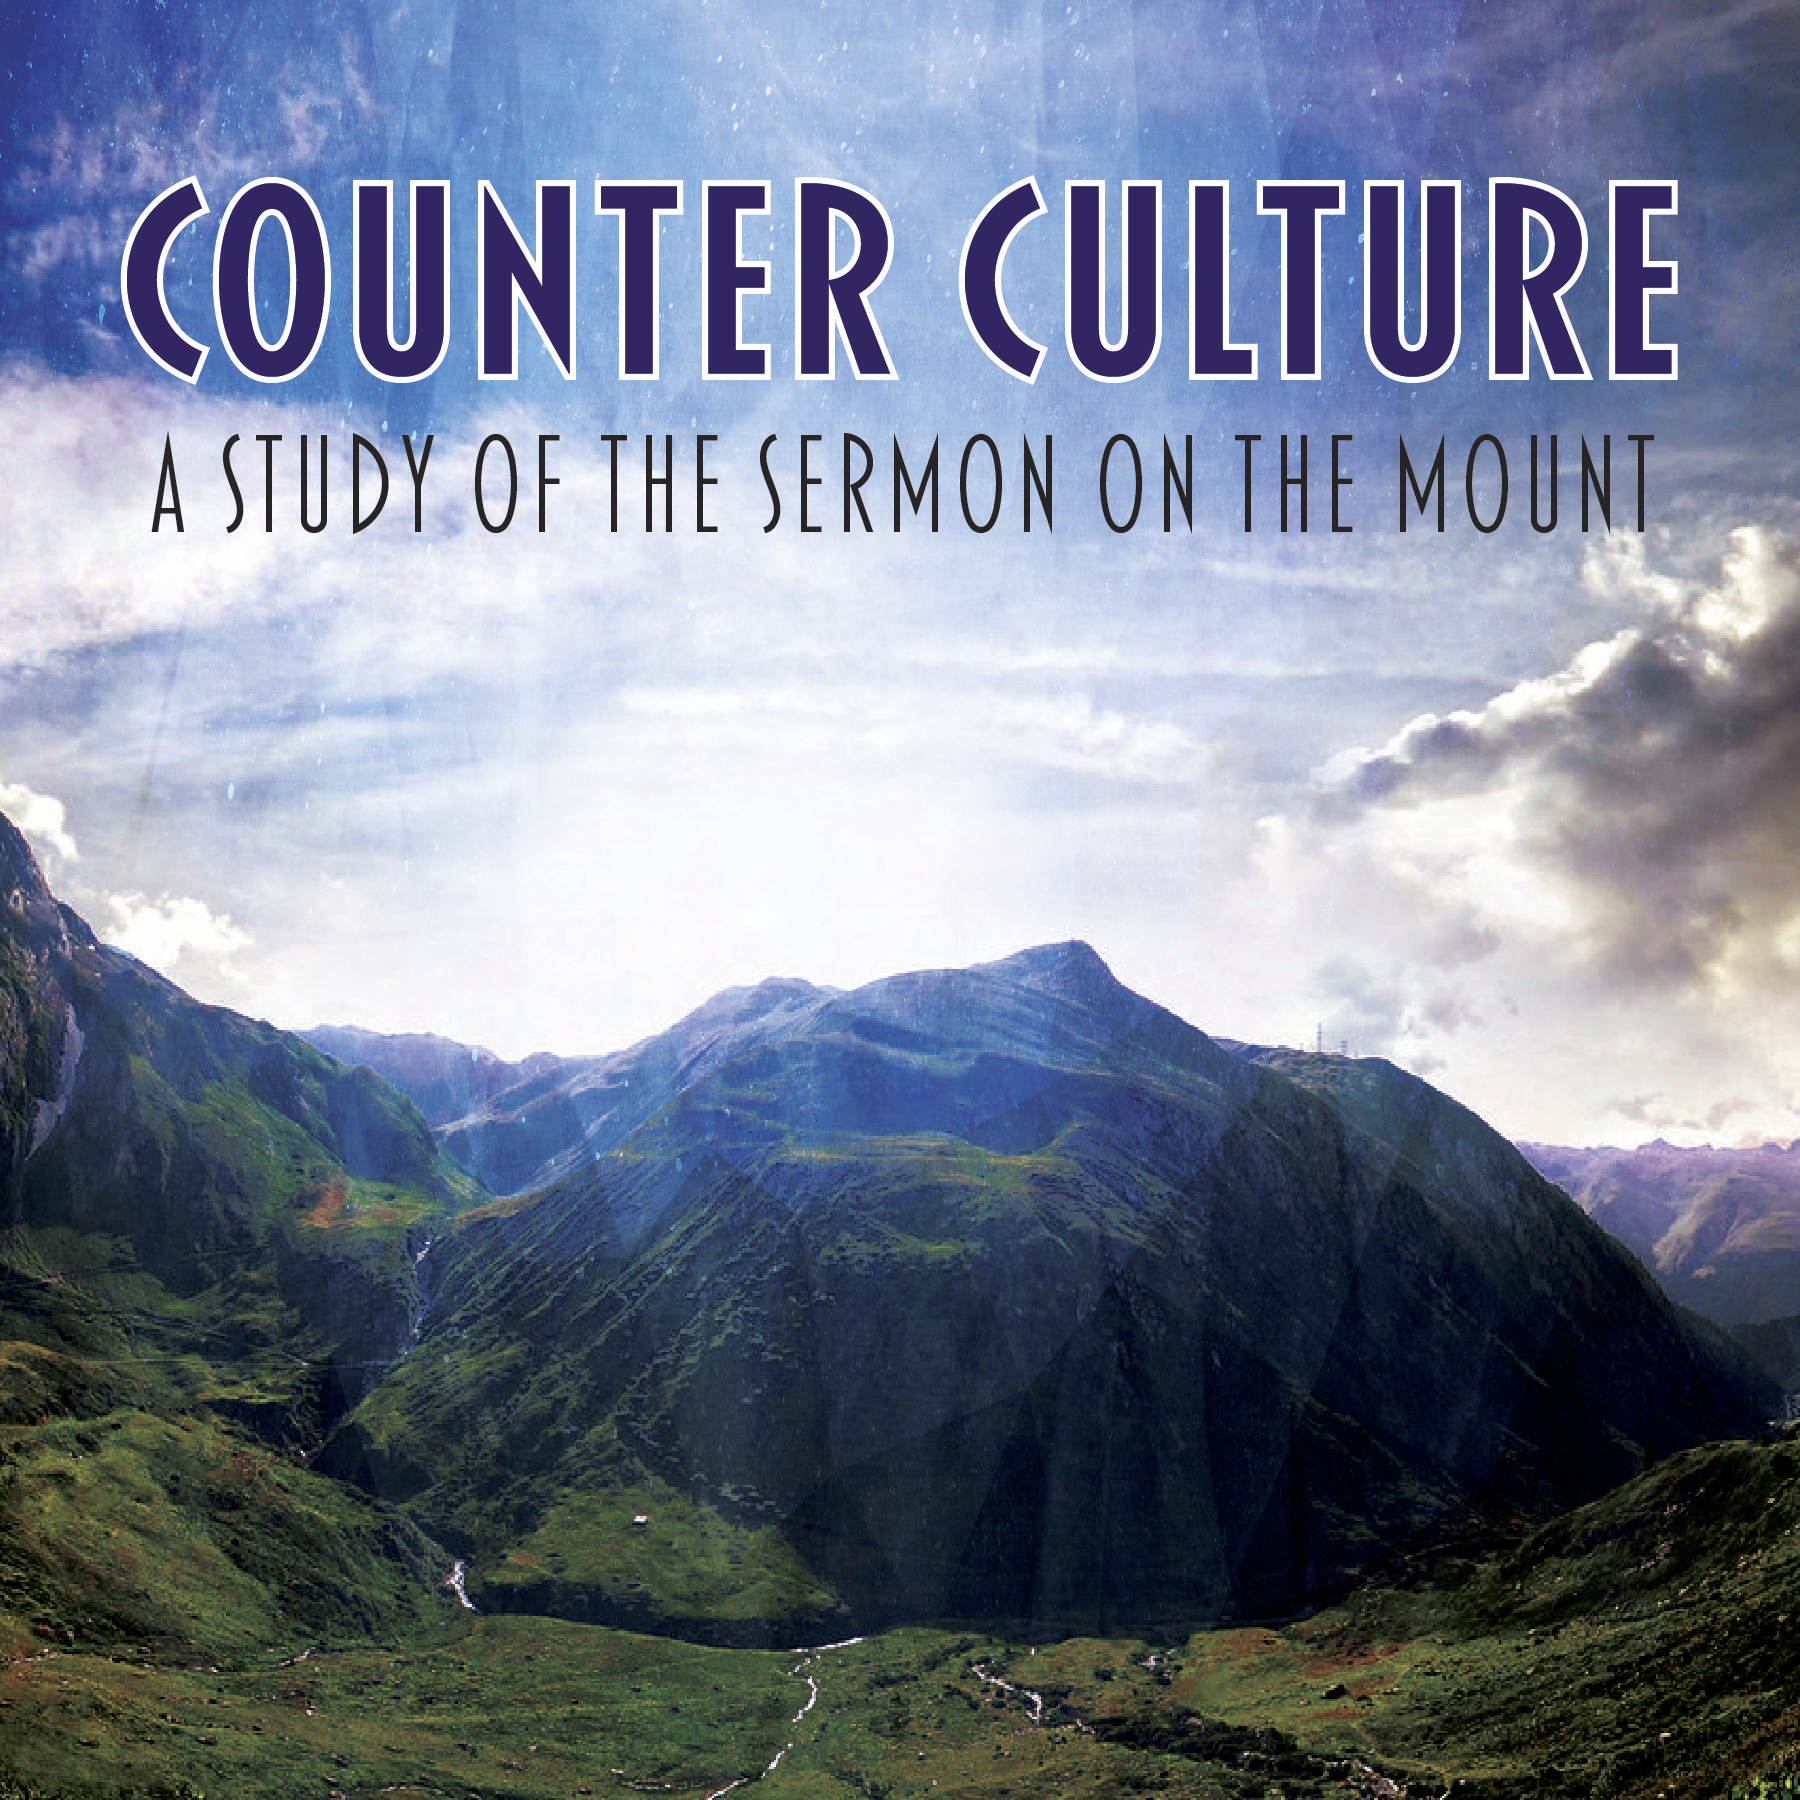 Counter Culture cover square.jpg